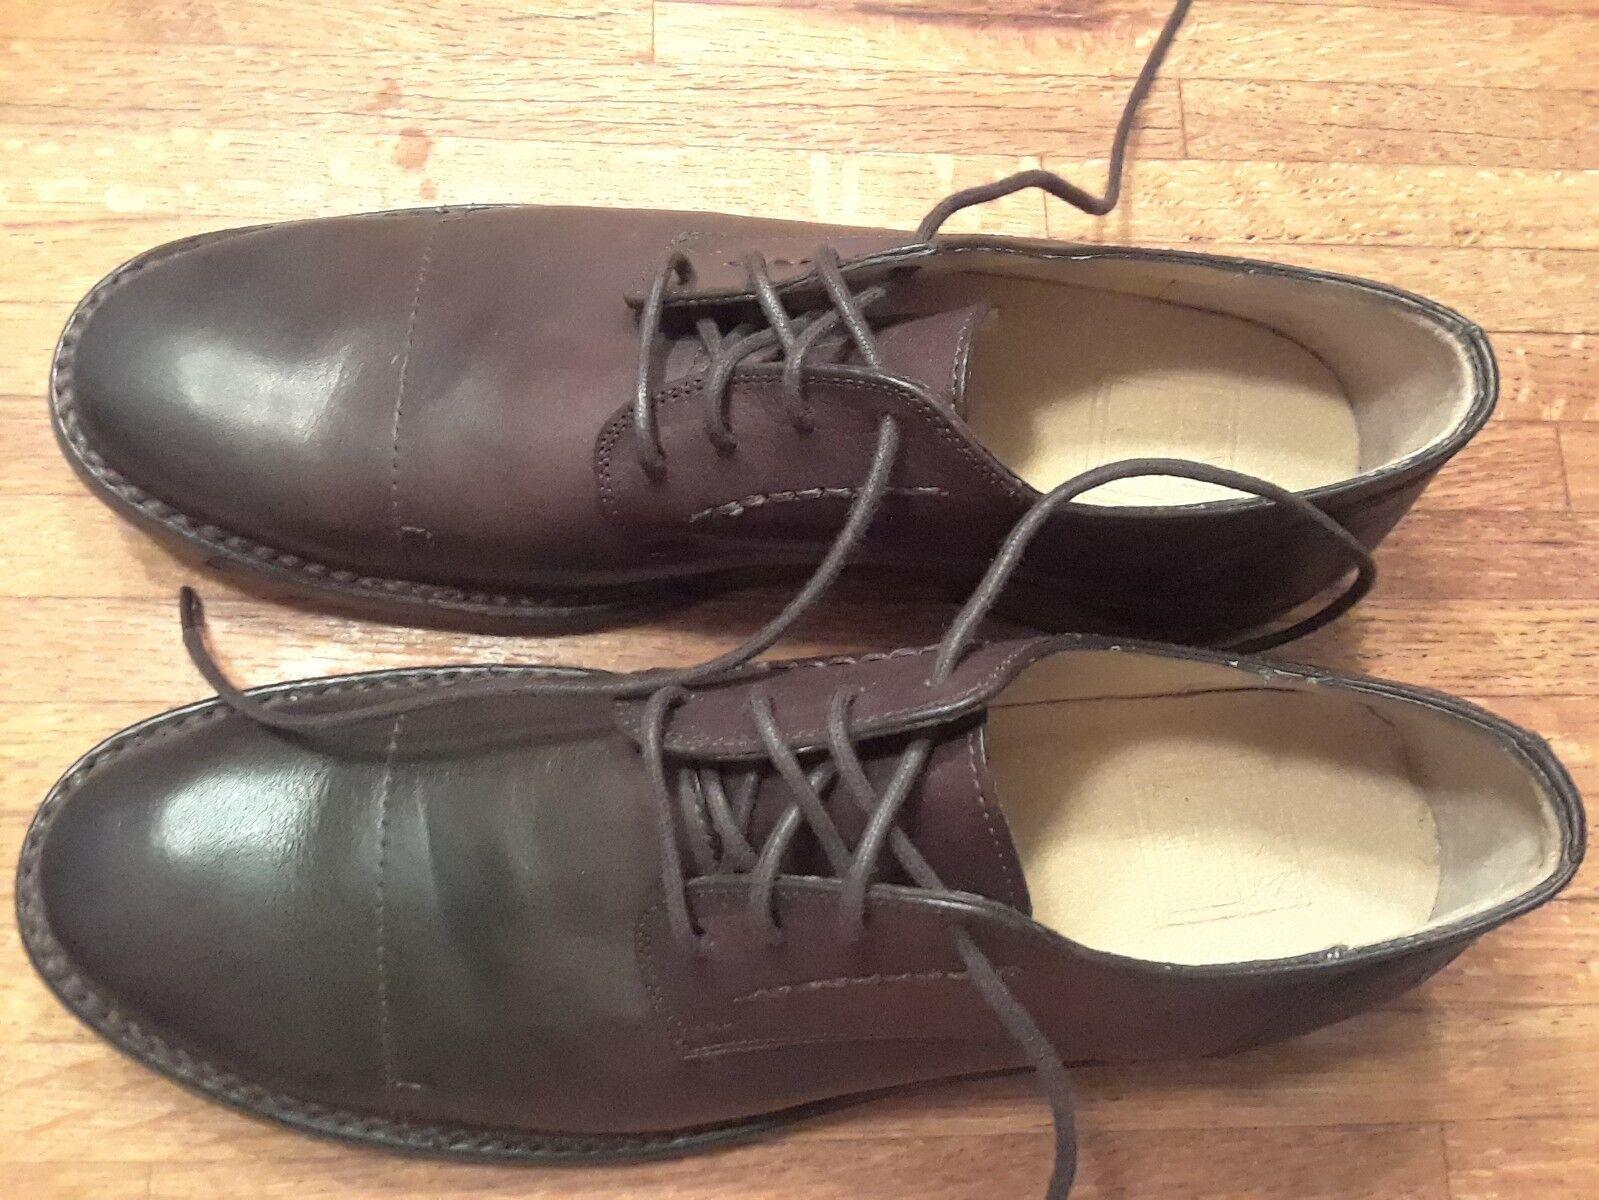 comprare a buon mercato Frye dark Marrone dress dress dress scarpe Uomo 9.5 D  basta comprarlo